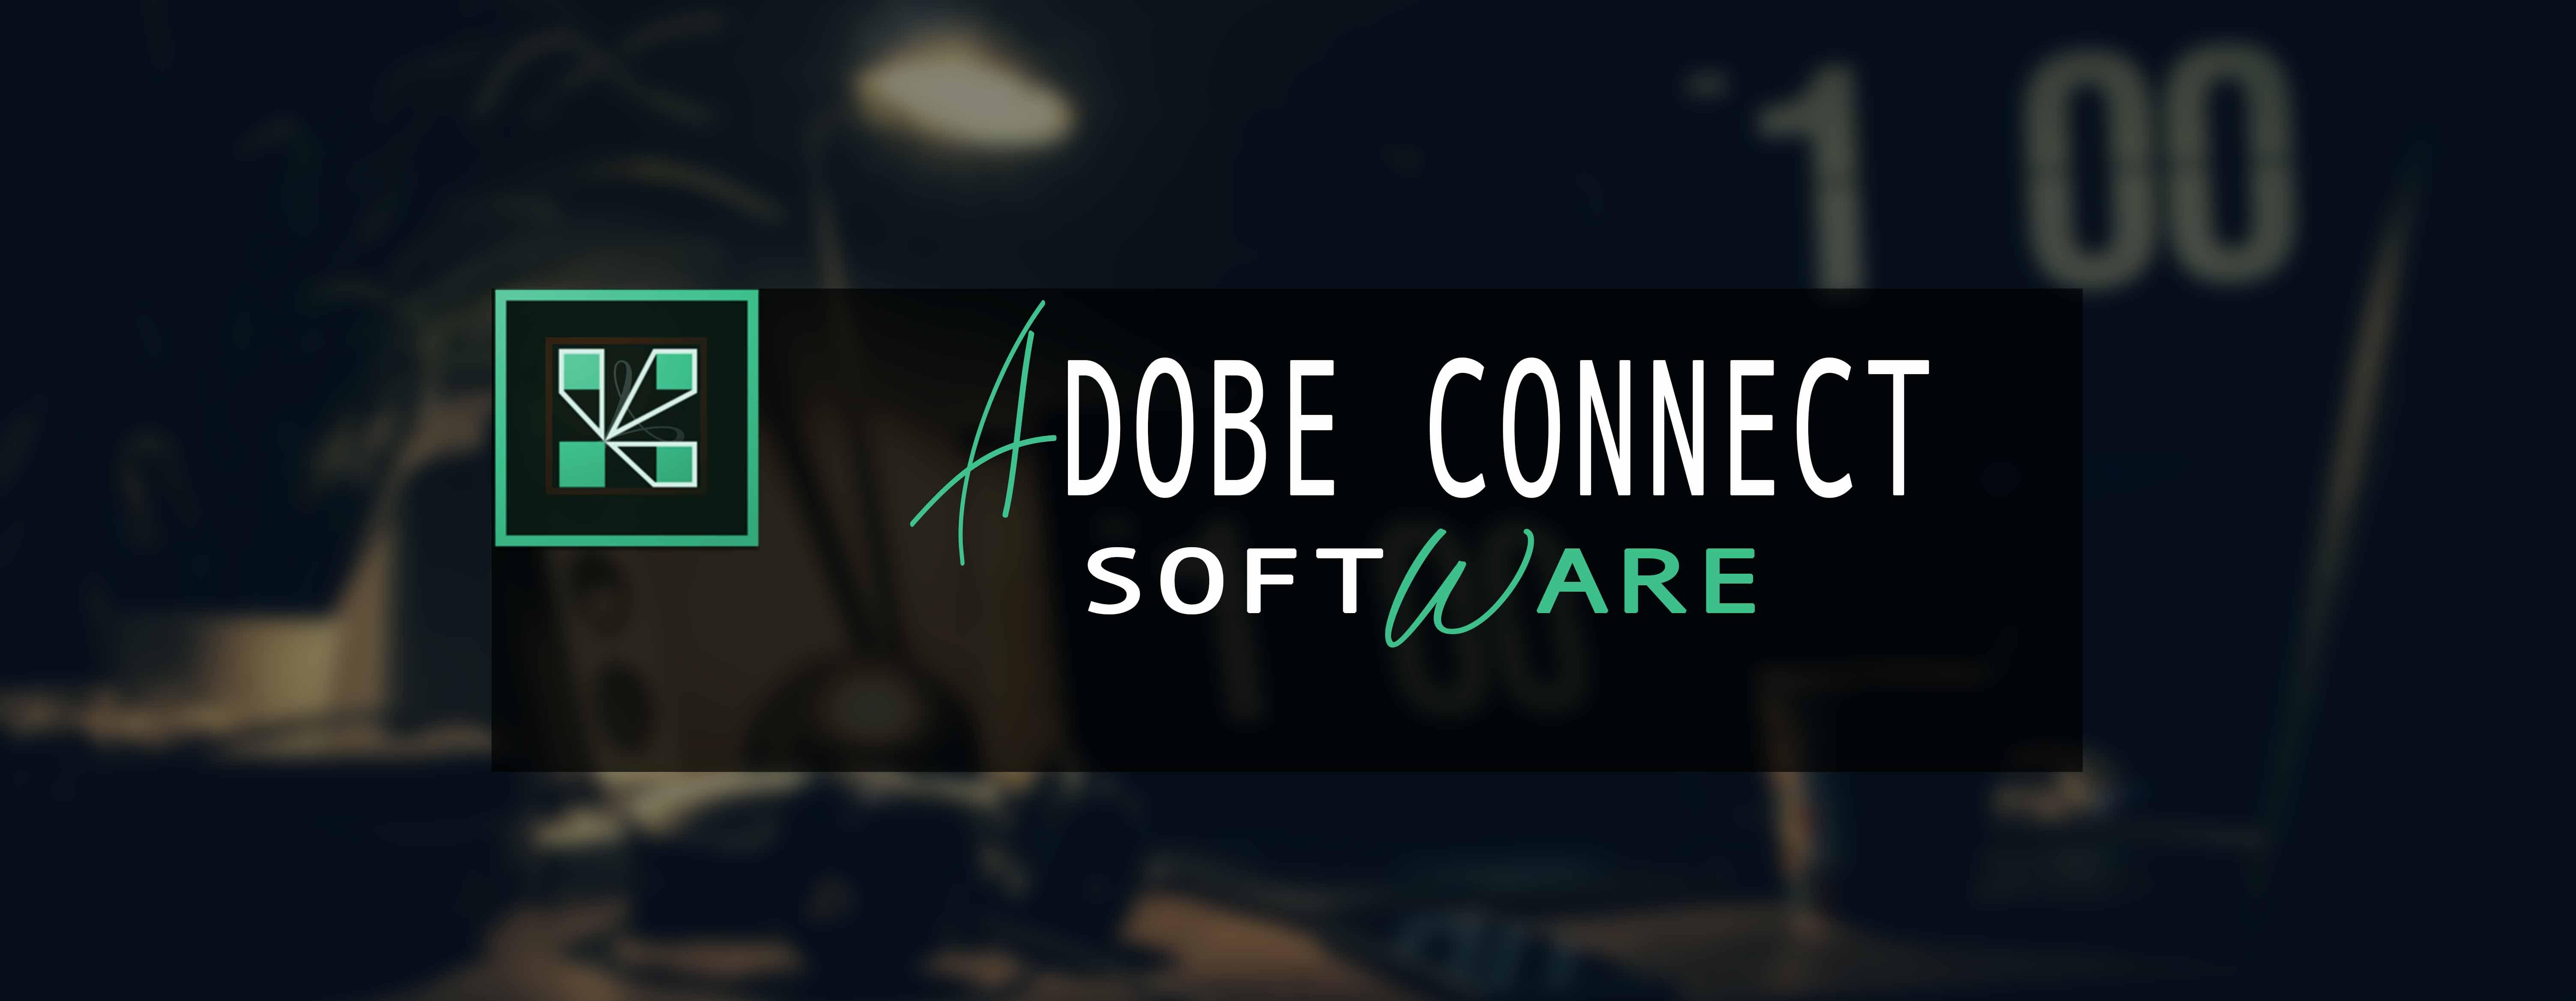 Adobe Connect Download Vu Assistance